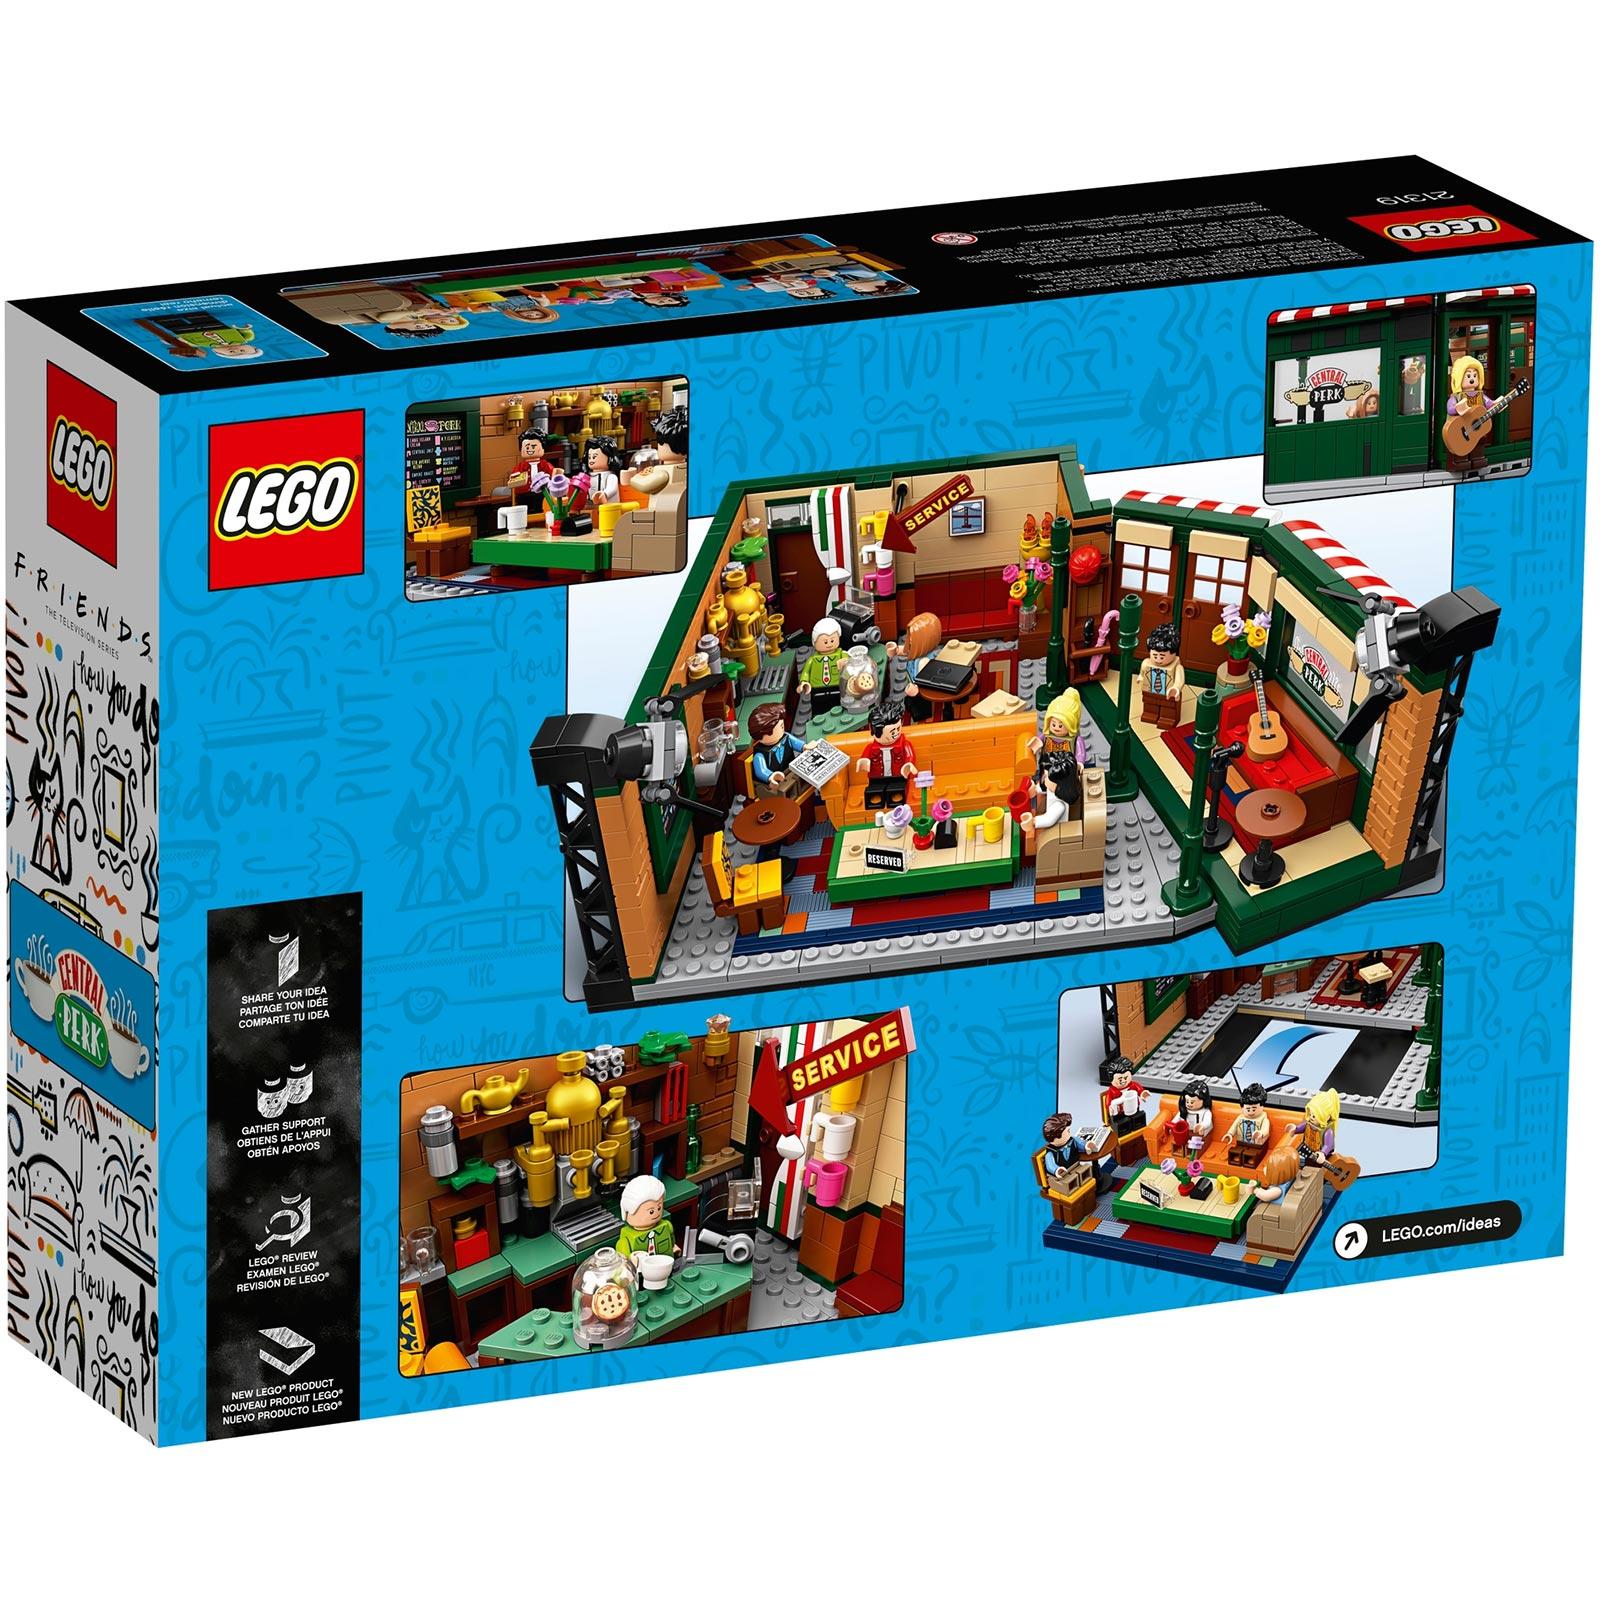 LEGO IDEAS Friends Central Perk Set Box Back